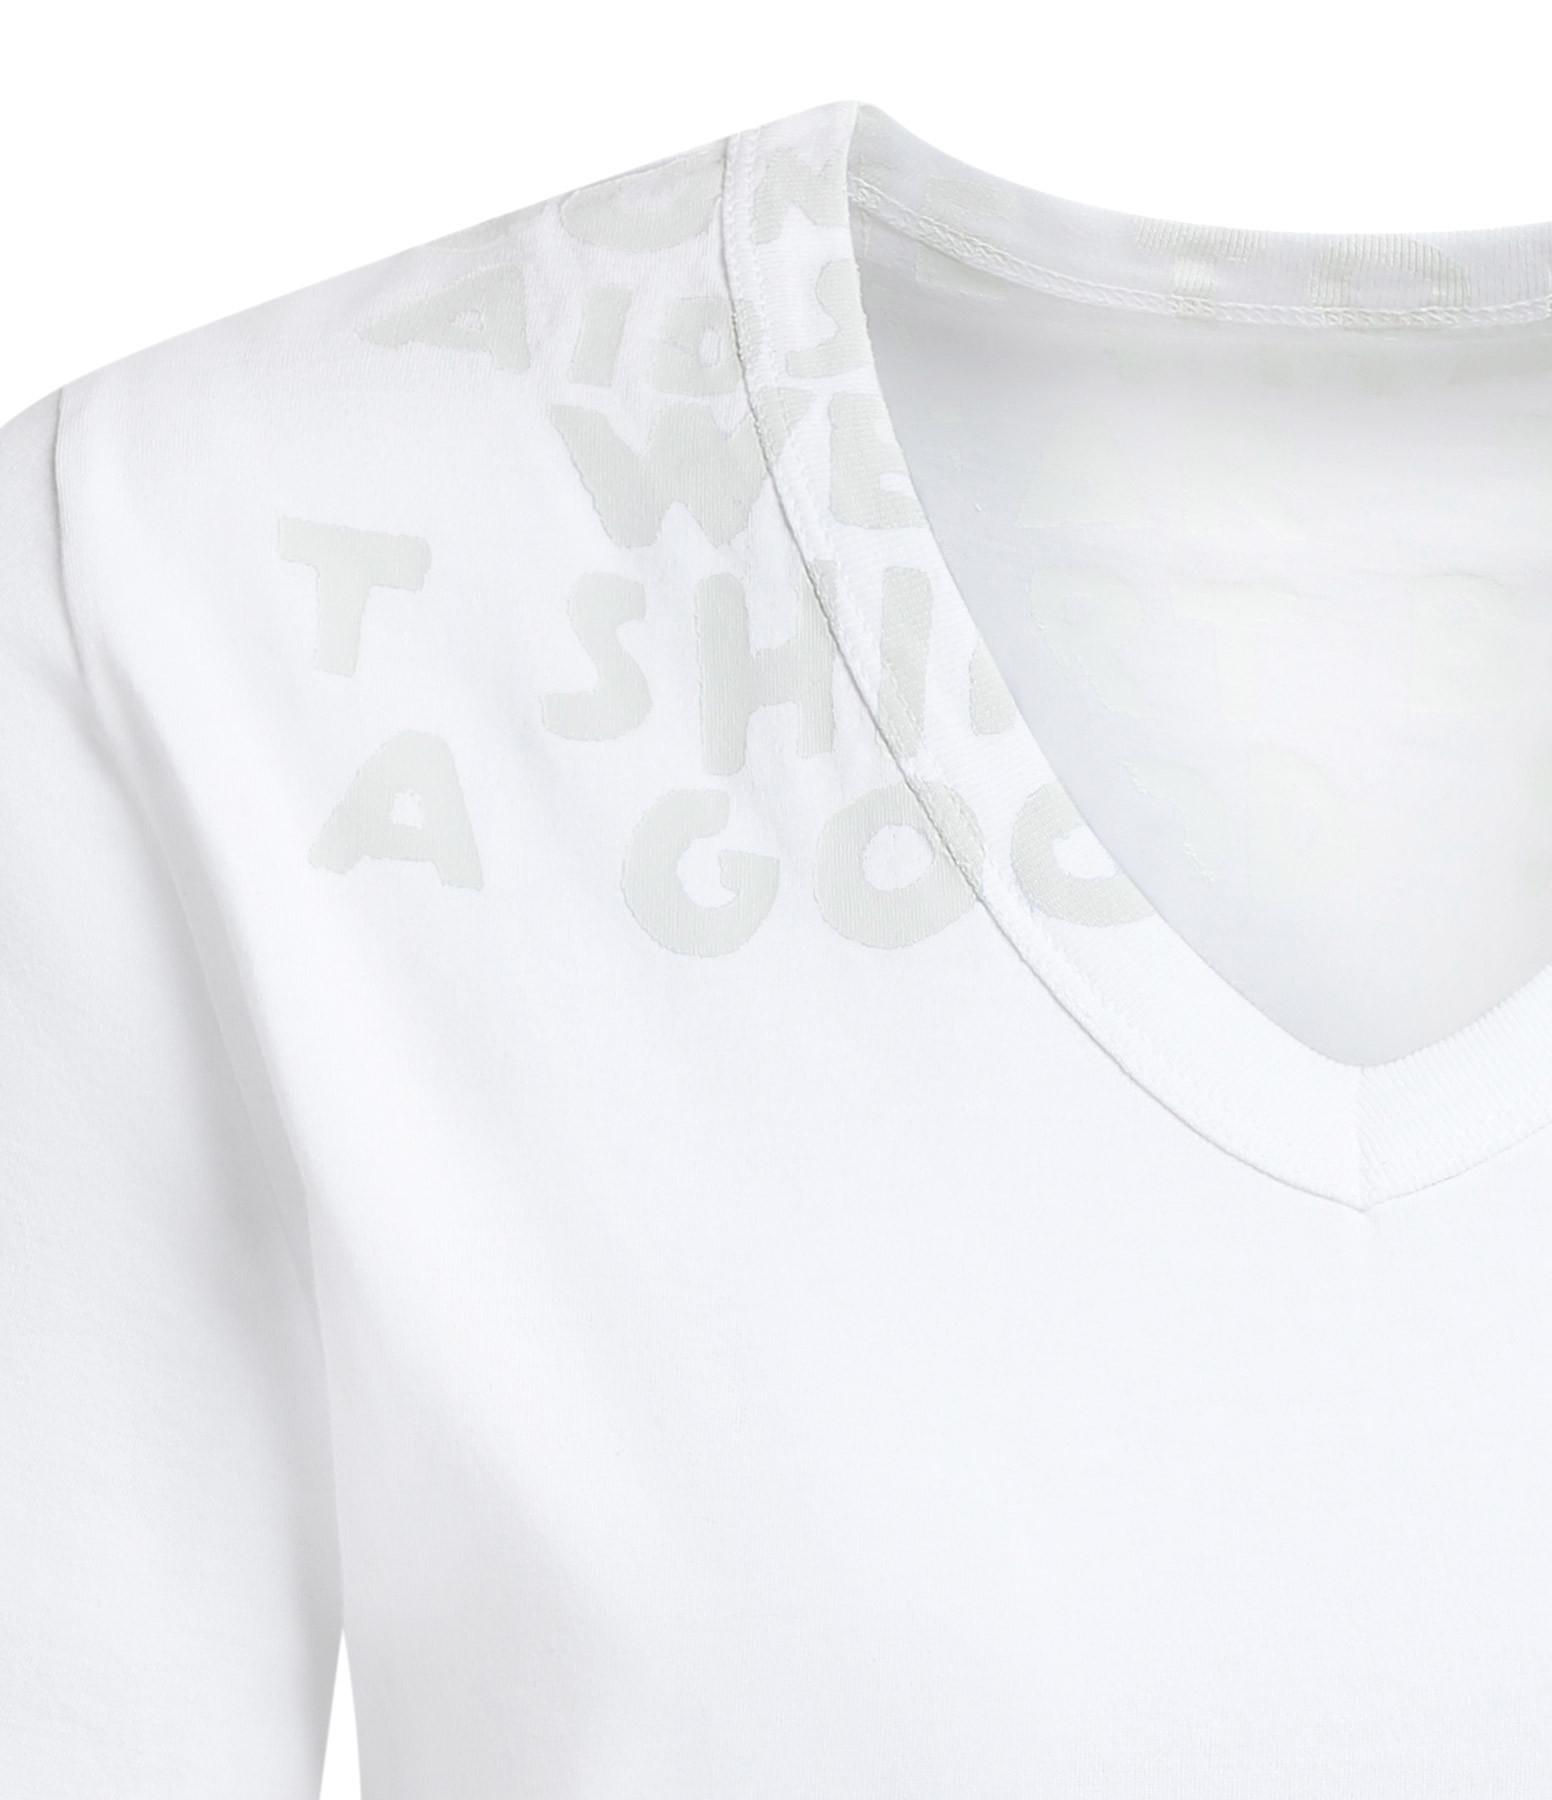 MM6 MAISON MARGIELA - Tee-shirt Court Blanc